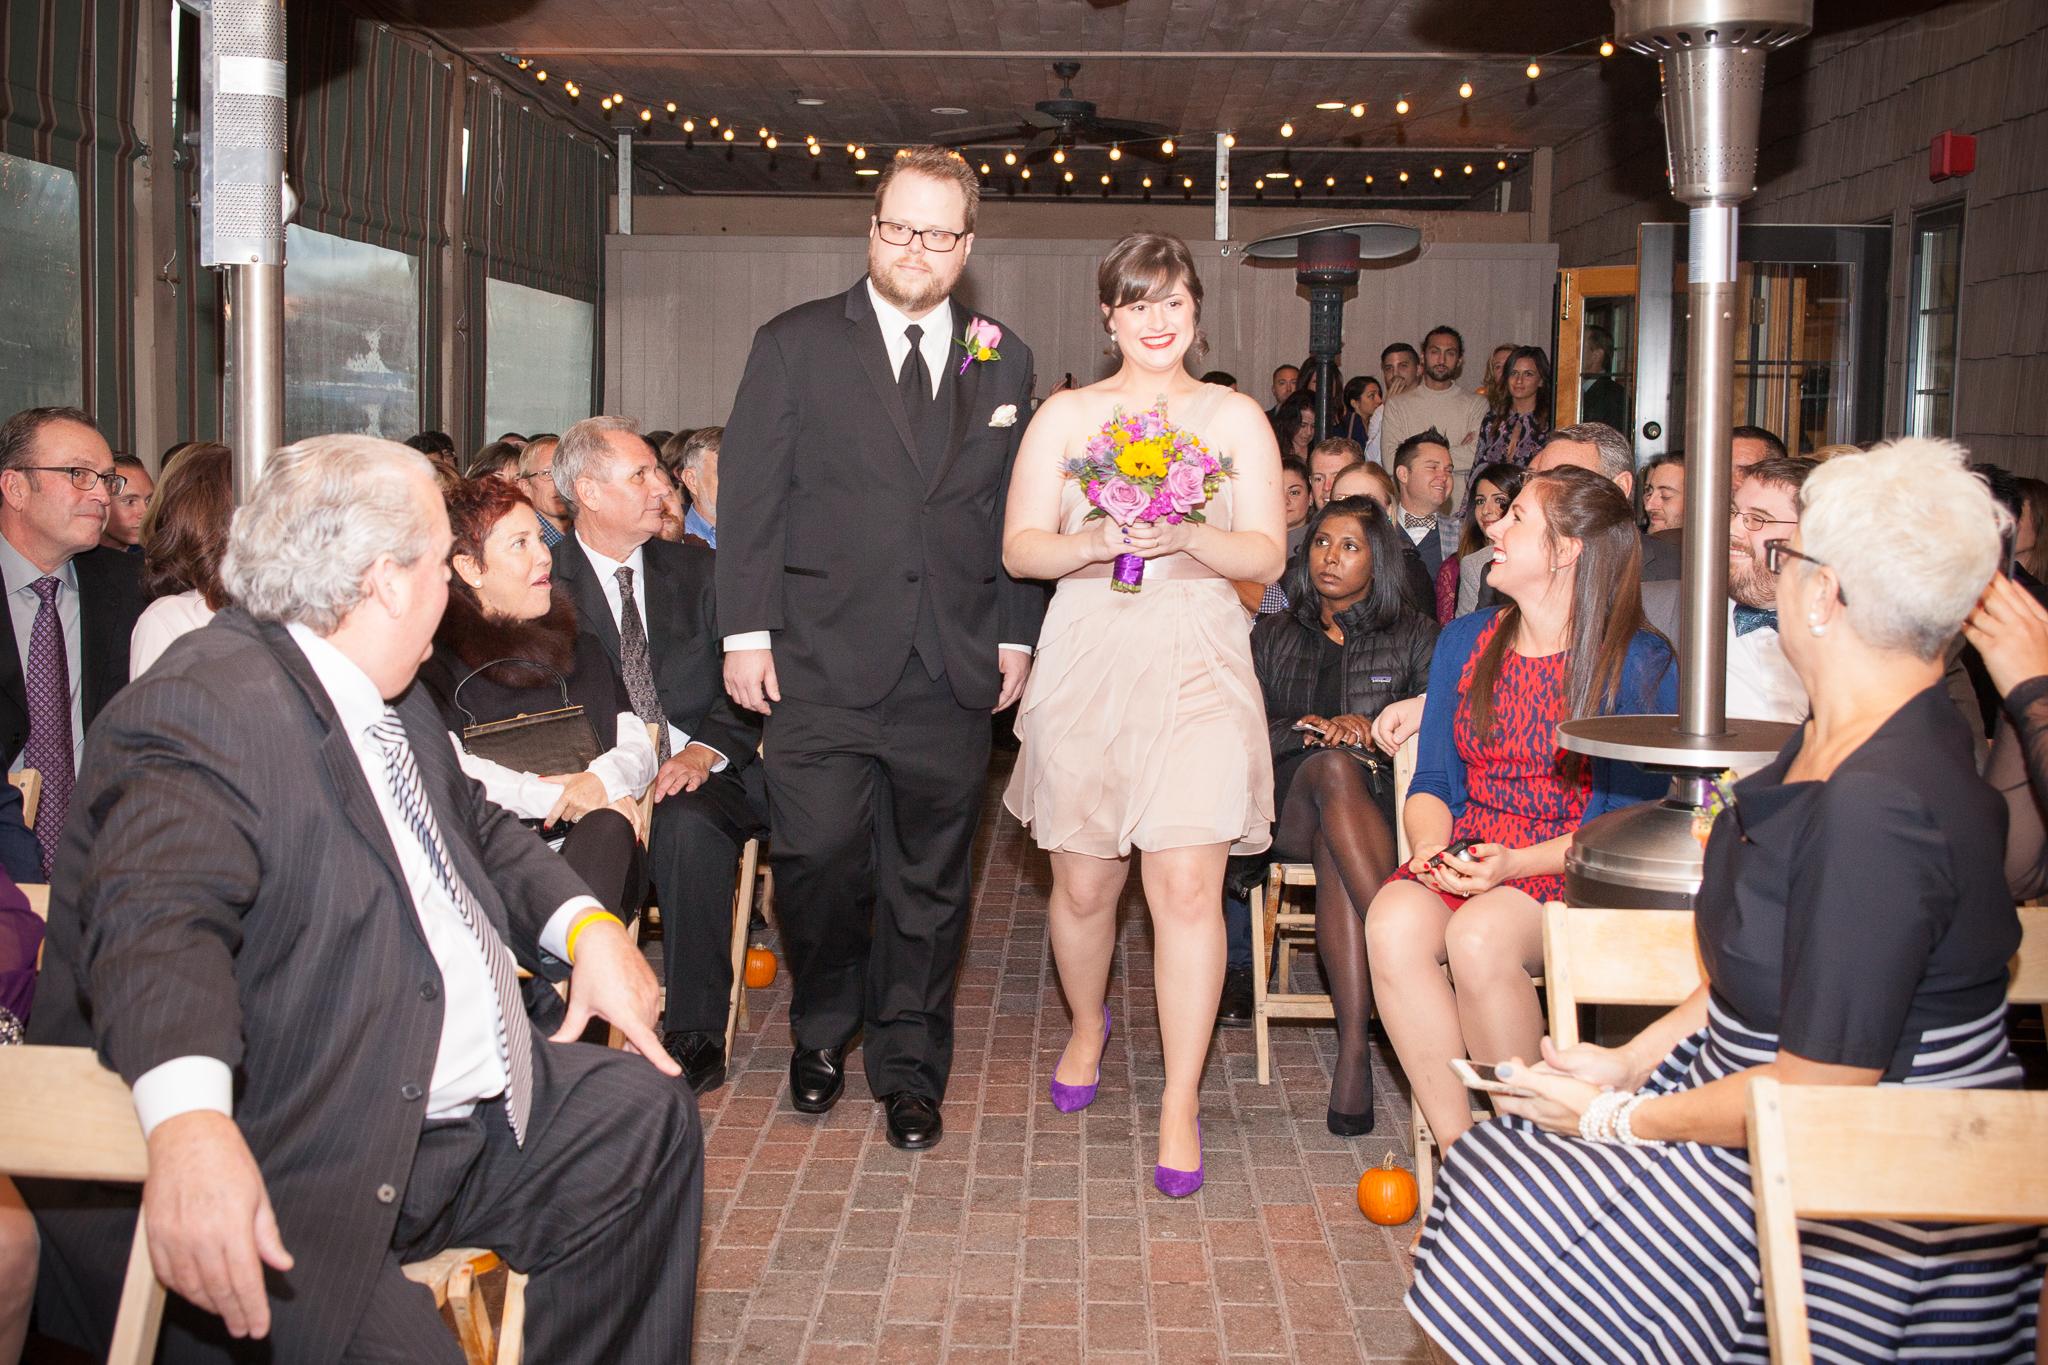 camuglia-whomstudio-chelsea_and_andy-nycphotographer-wedding-brooklyn-buffalo-timberlodge-067-0550.jpg